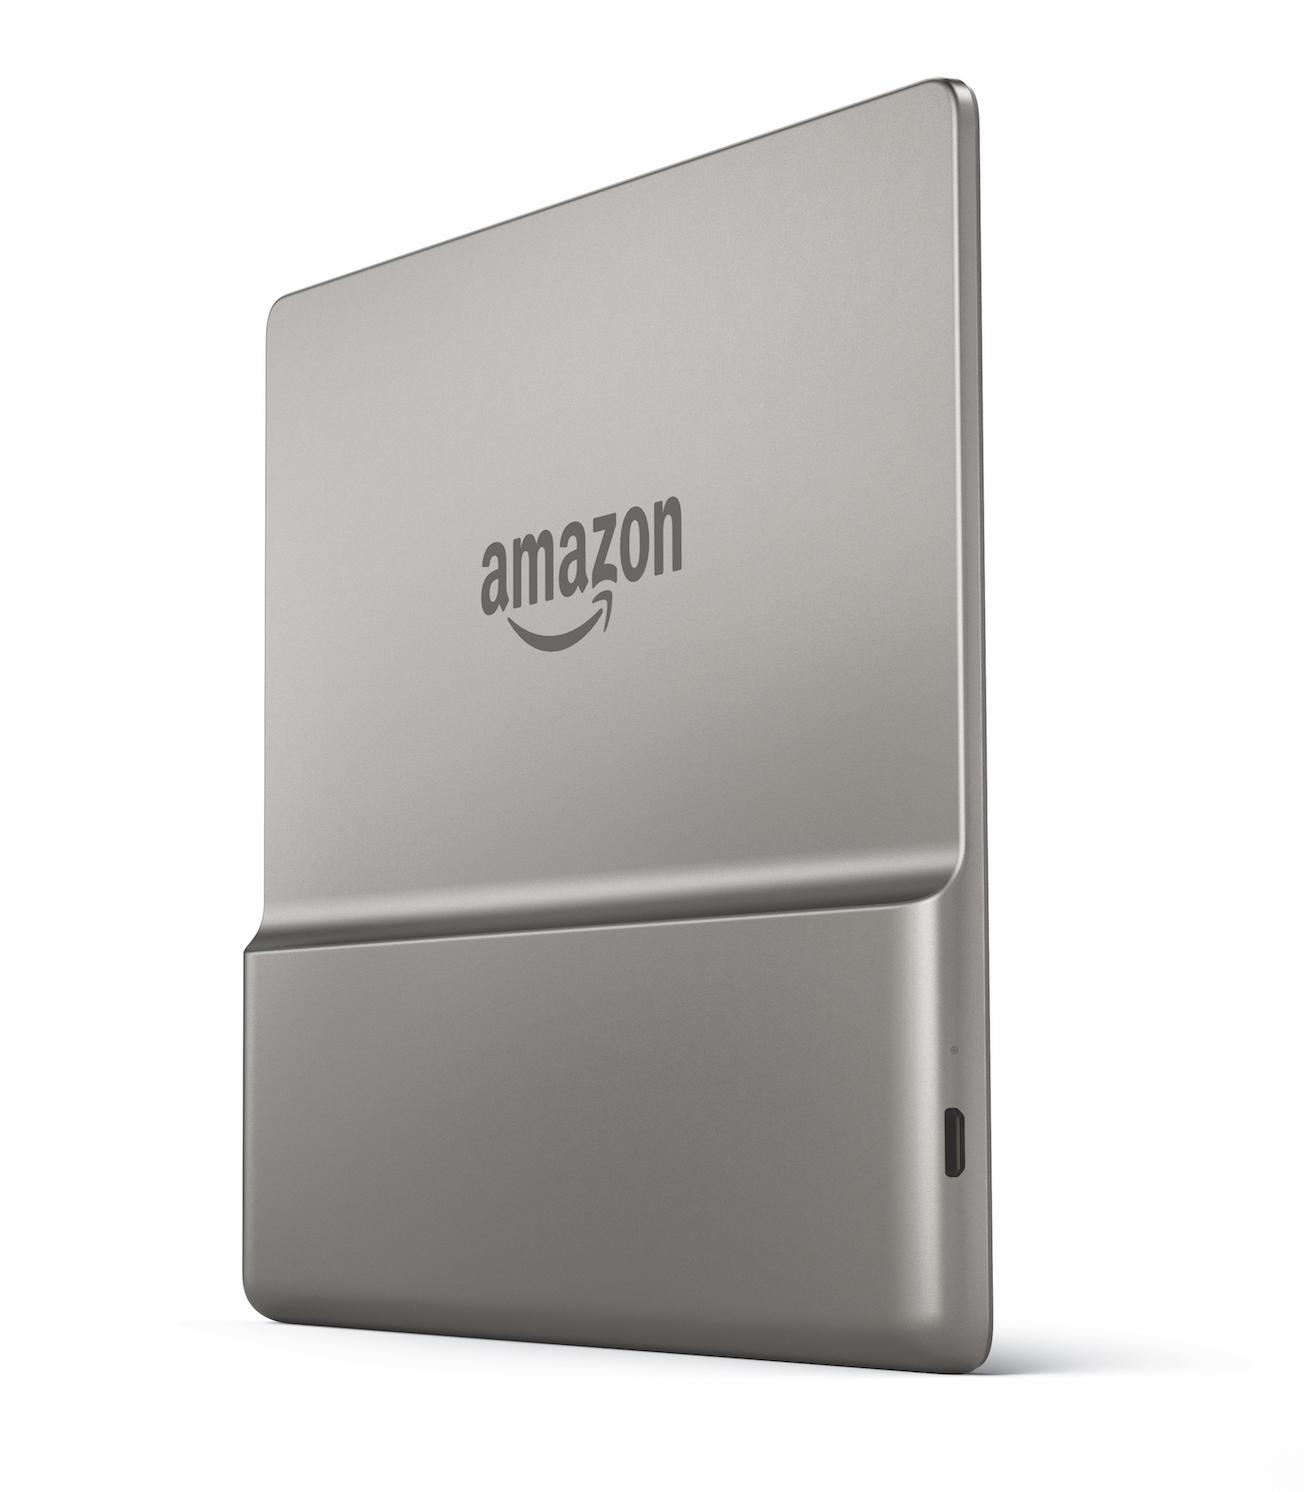 Neuer Kindle Oasis im Hands on: Amazons großer E-Book-Reader ist wasserdicht - Neuer Kindle Oasis (Bild: Amazon)